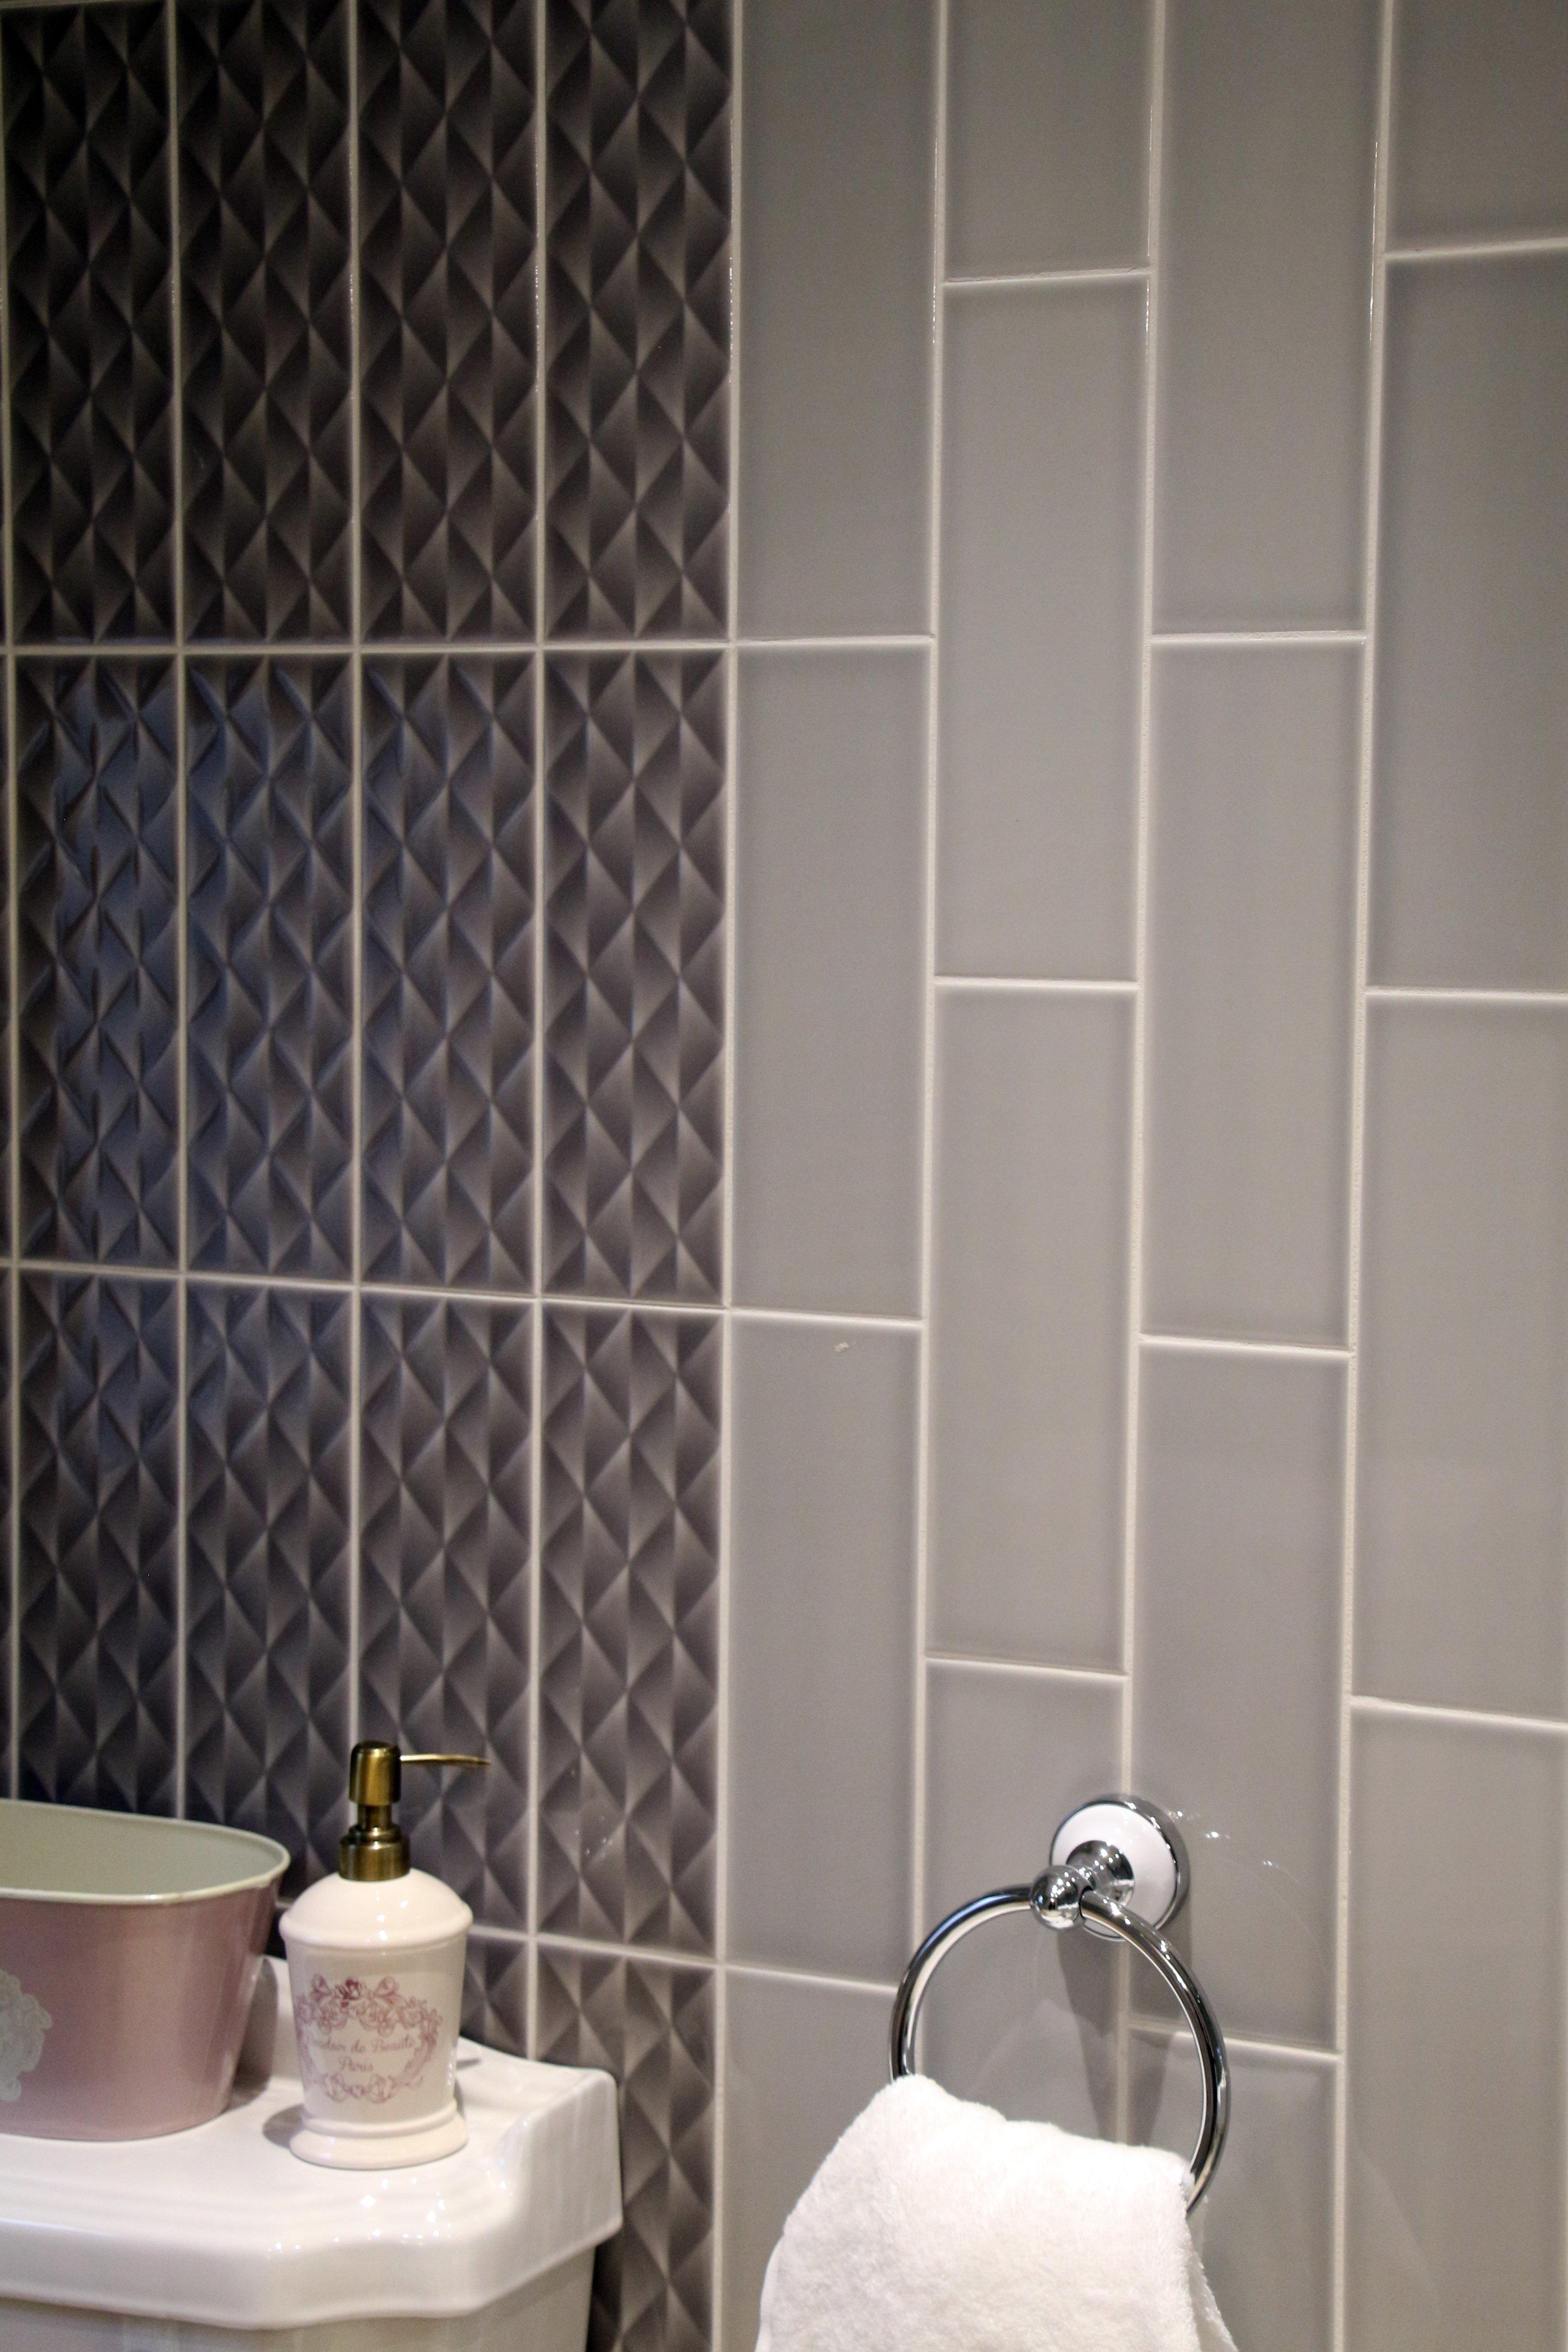 Bathroom tiles johnson ctd floor tile aquare mm johnson tiles bathroom tiles johnson johnson tiles timeless design wows dailygadgetfo Gallery